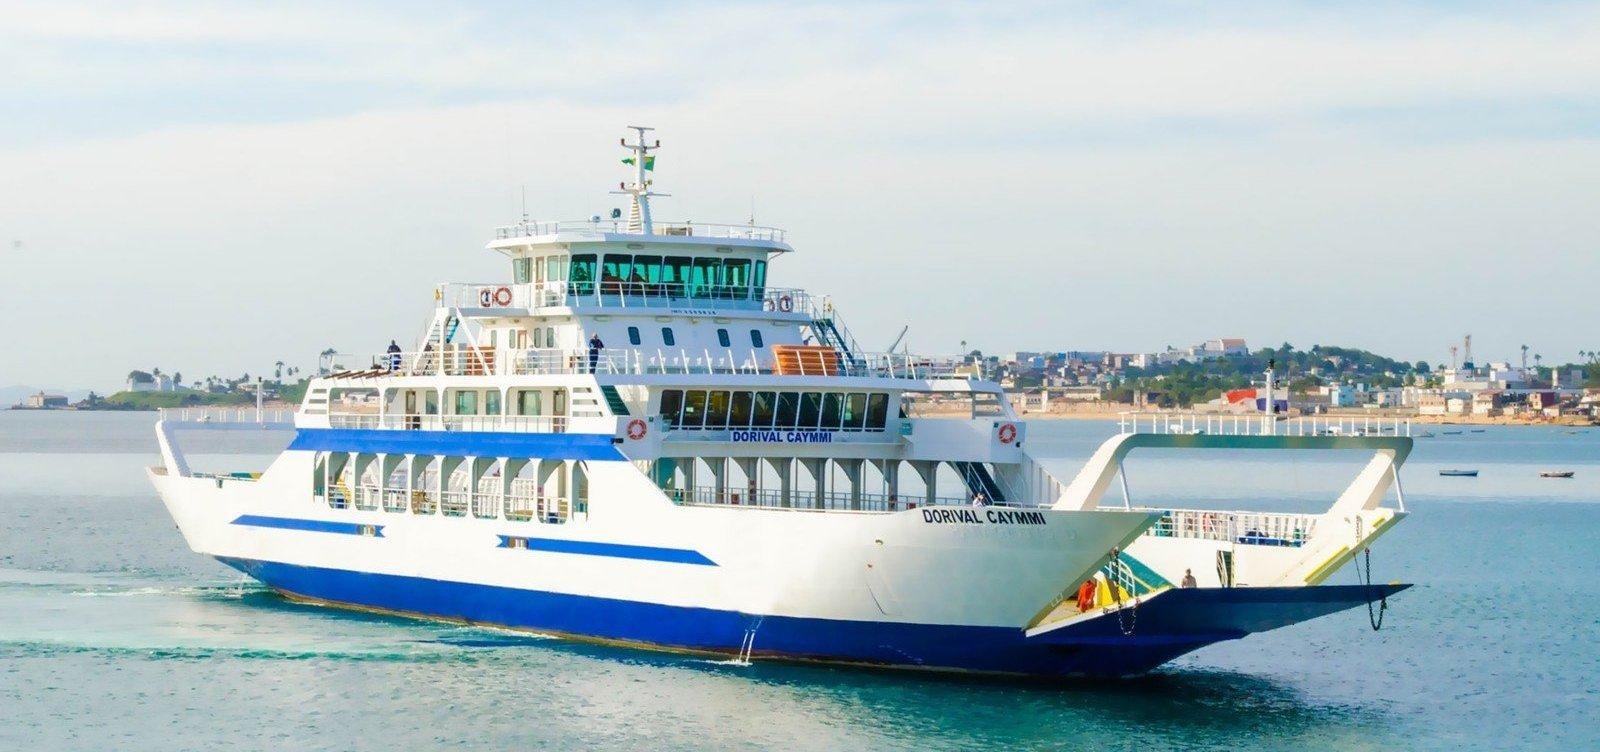 Rui manda suspender ferry-boat no feriado da Semana Santa - Metro 1